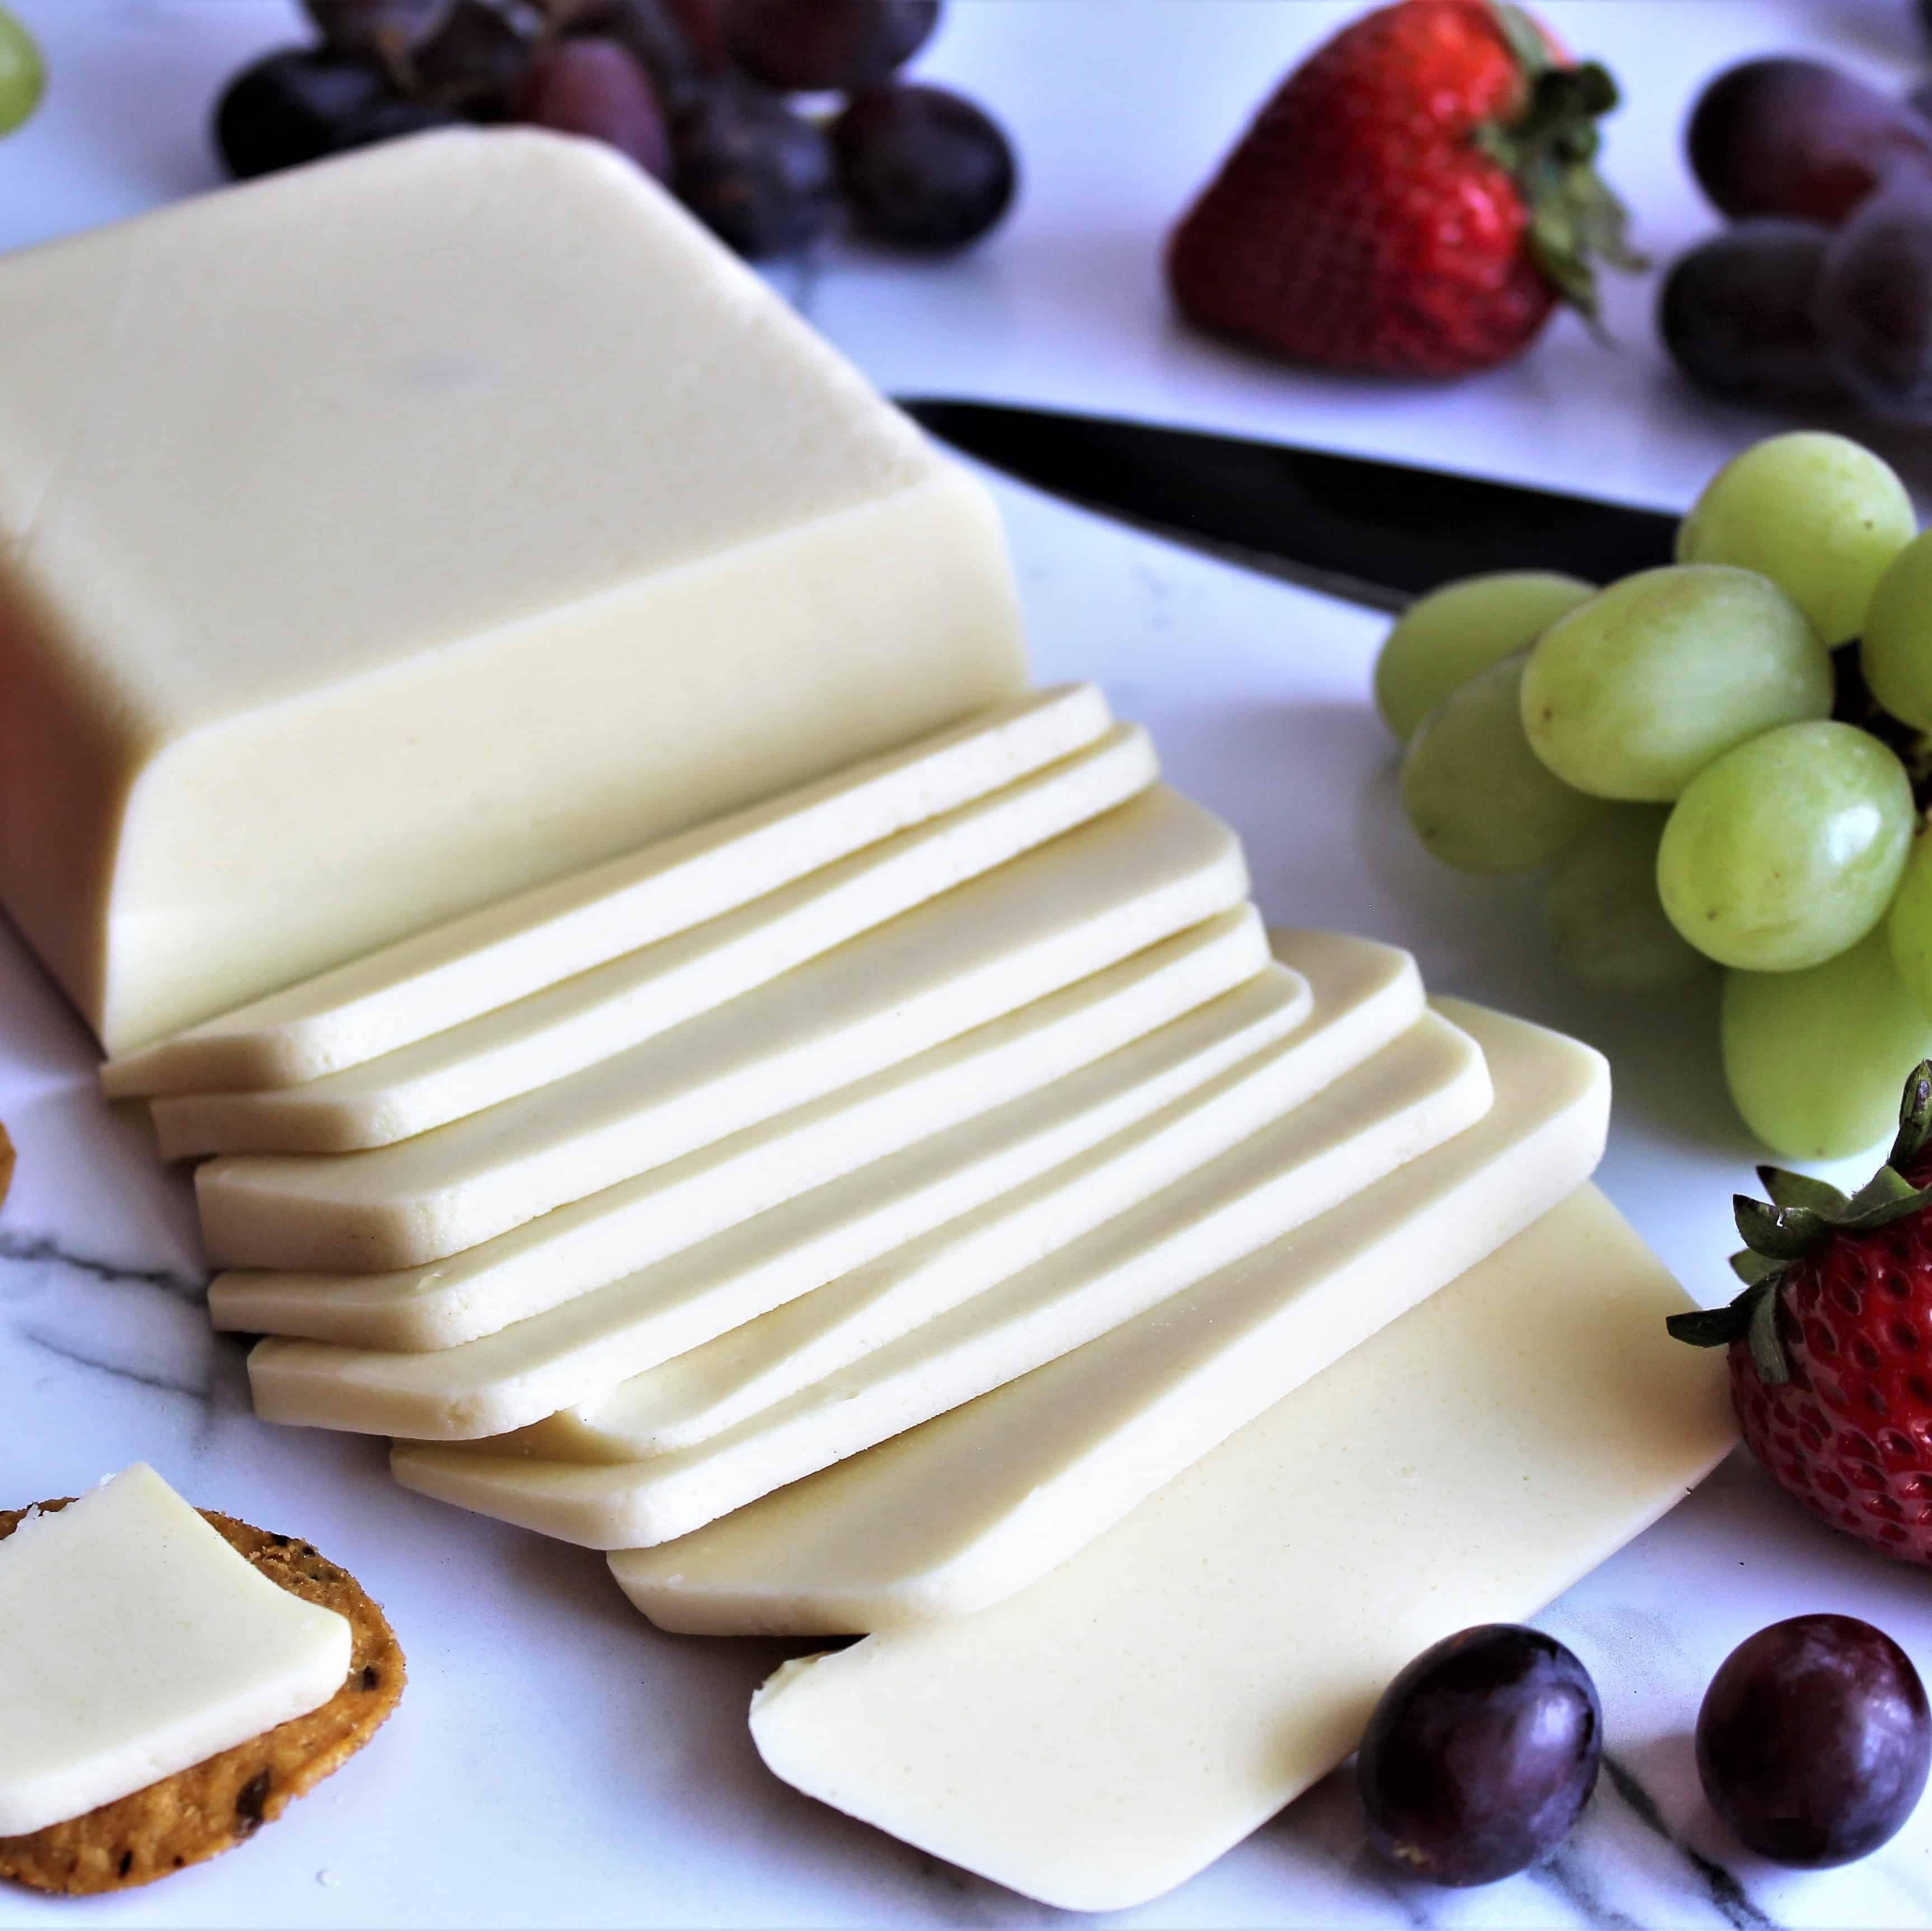 How To Make Vegan Cheese Vegan Provolone Via Https Www Pinterest Com Gfveganmeals Vegan Cheese Recipes Vegan Cheese Milk Recipes